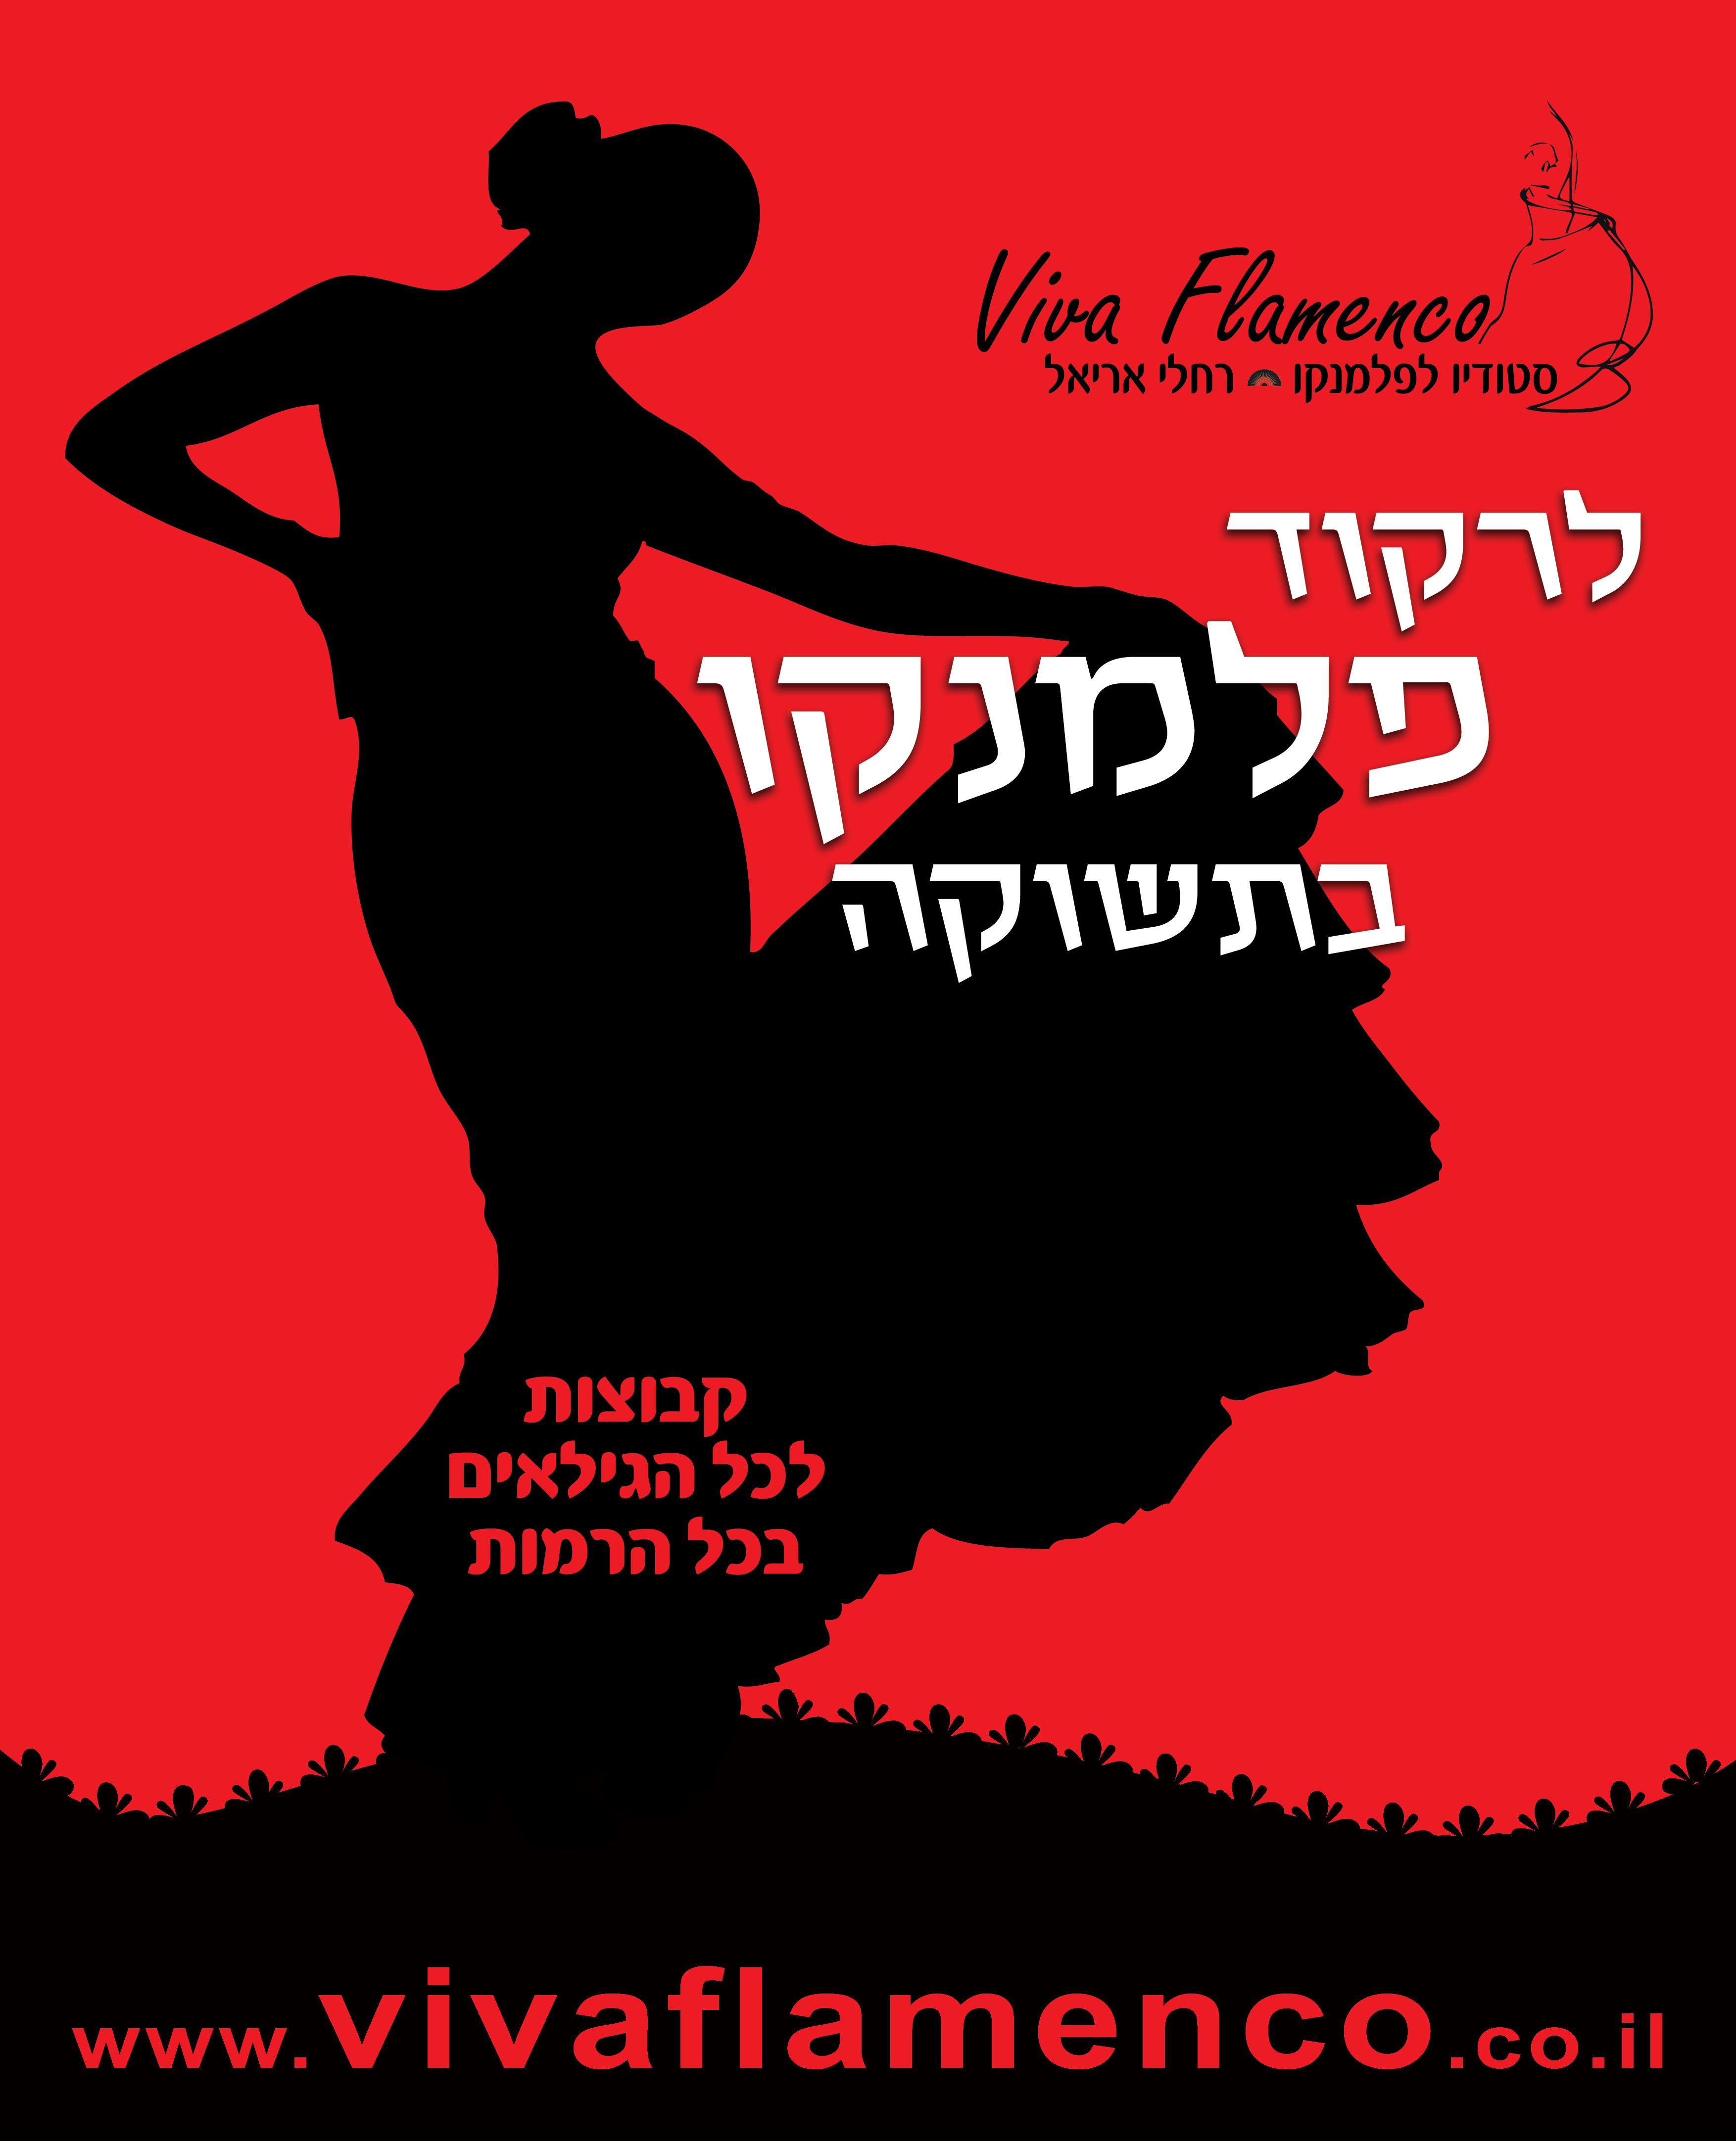 viva flamenco poster